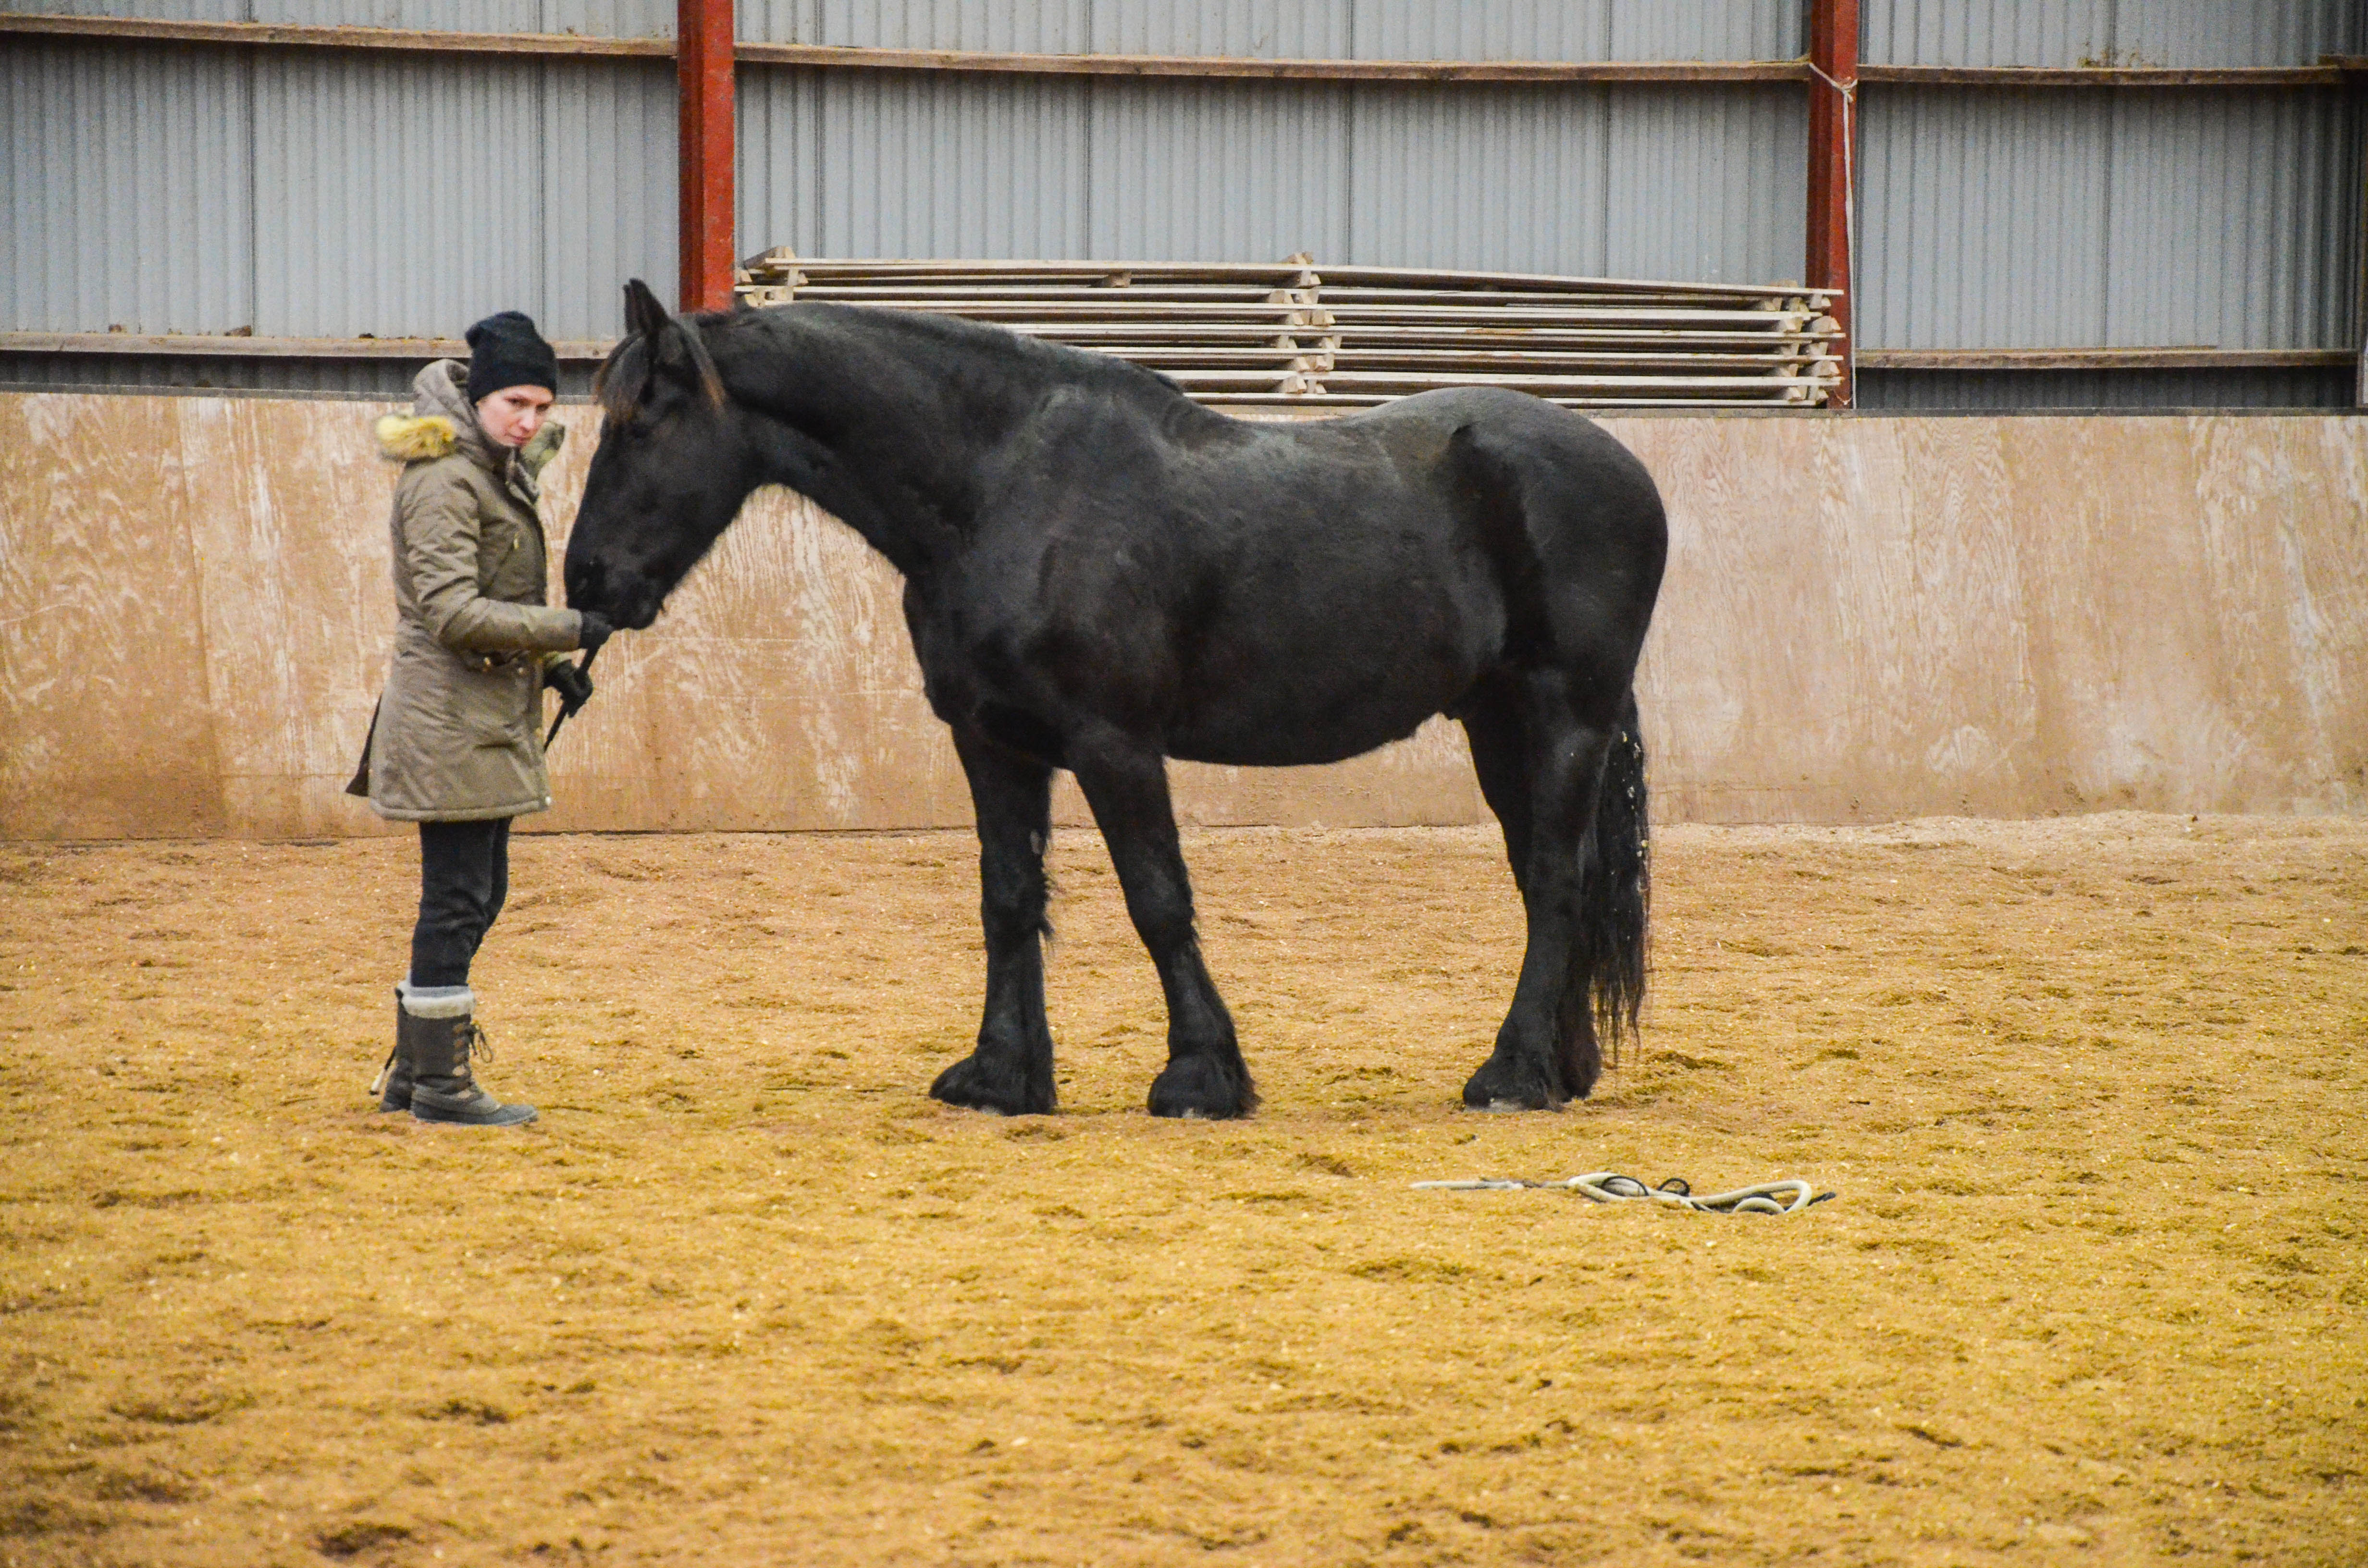 God kontakt er essensielt i et hvert forhold til hest